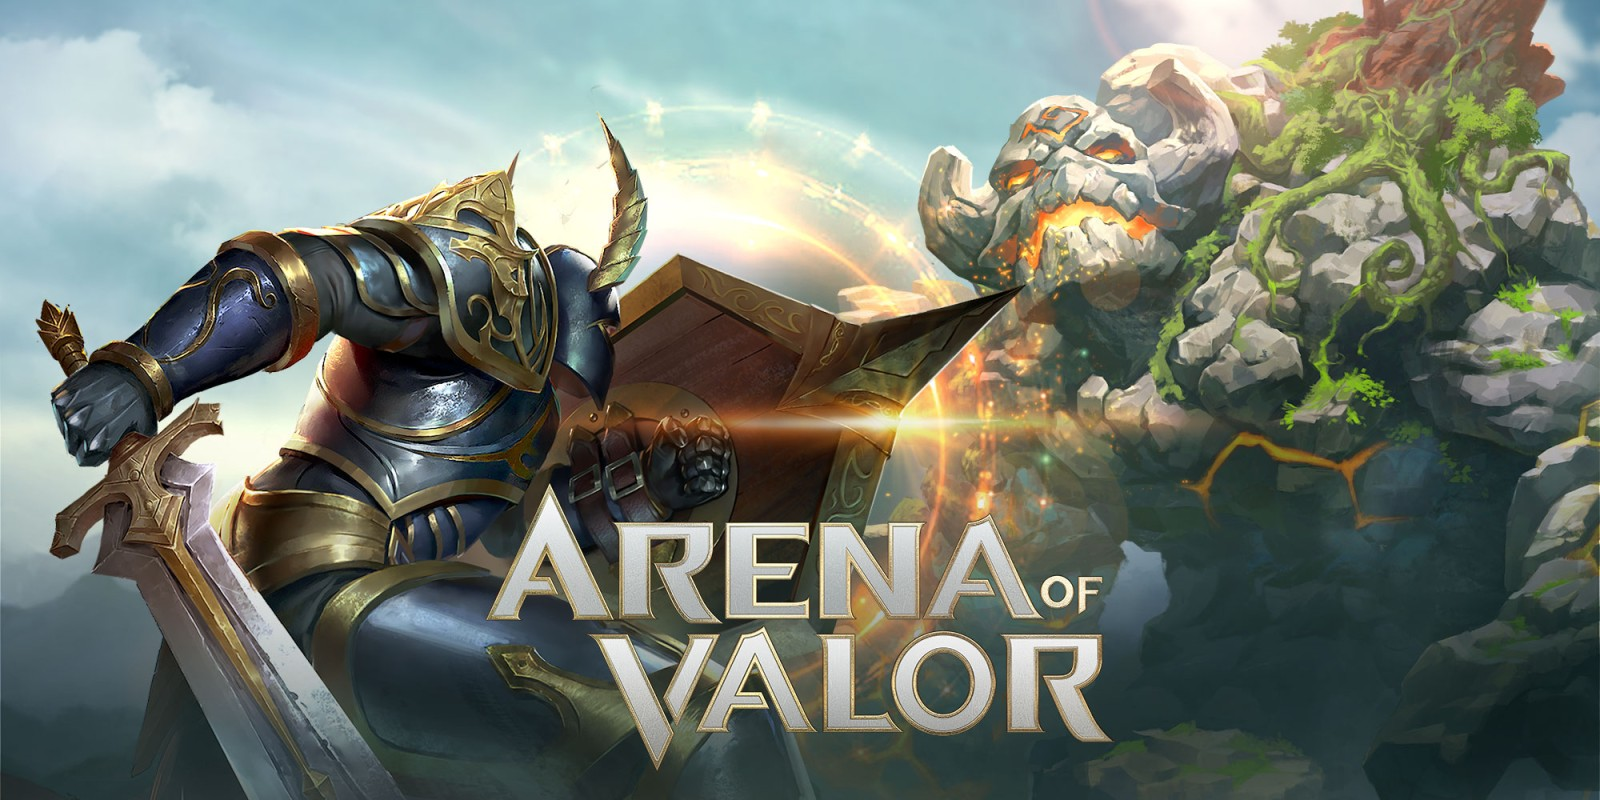 arena-of-valor-3.jpg